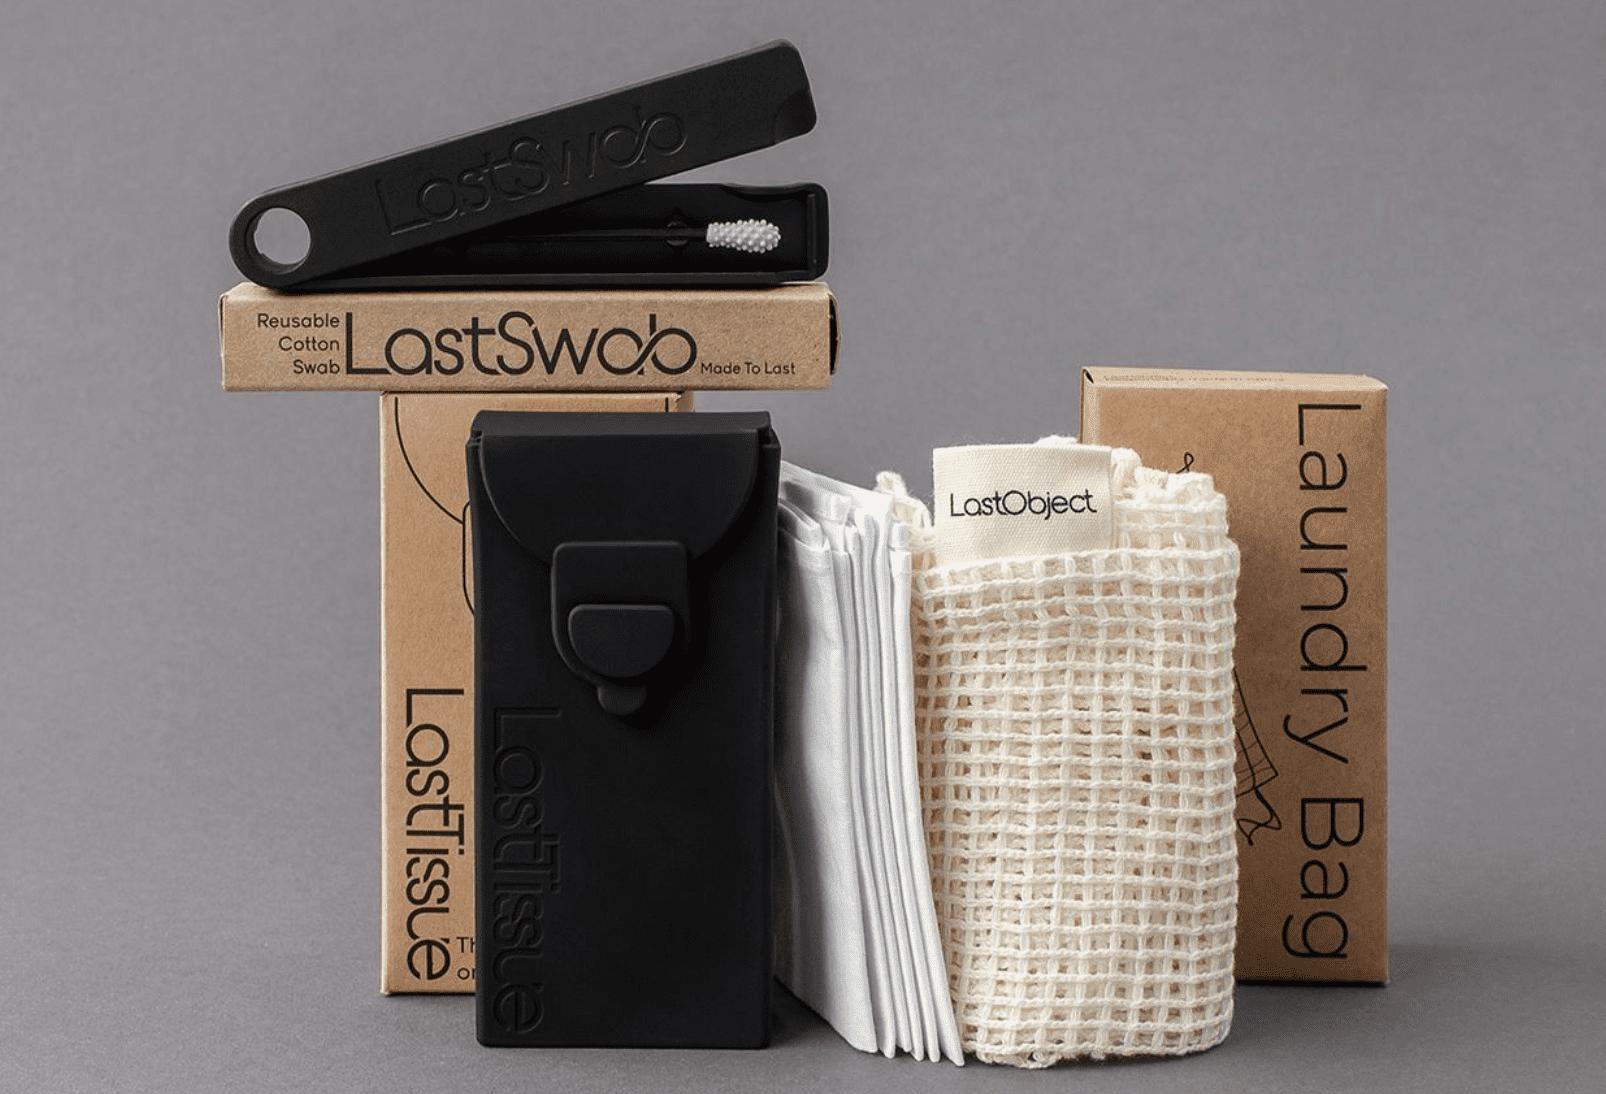 LastObject Personal Care Kit